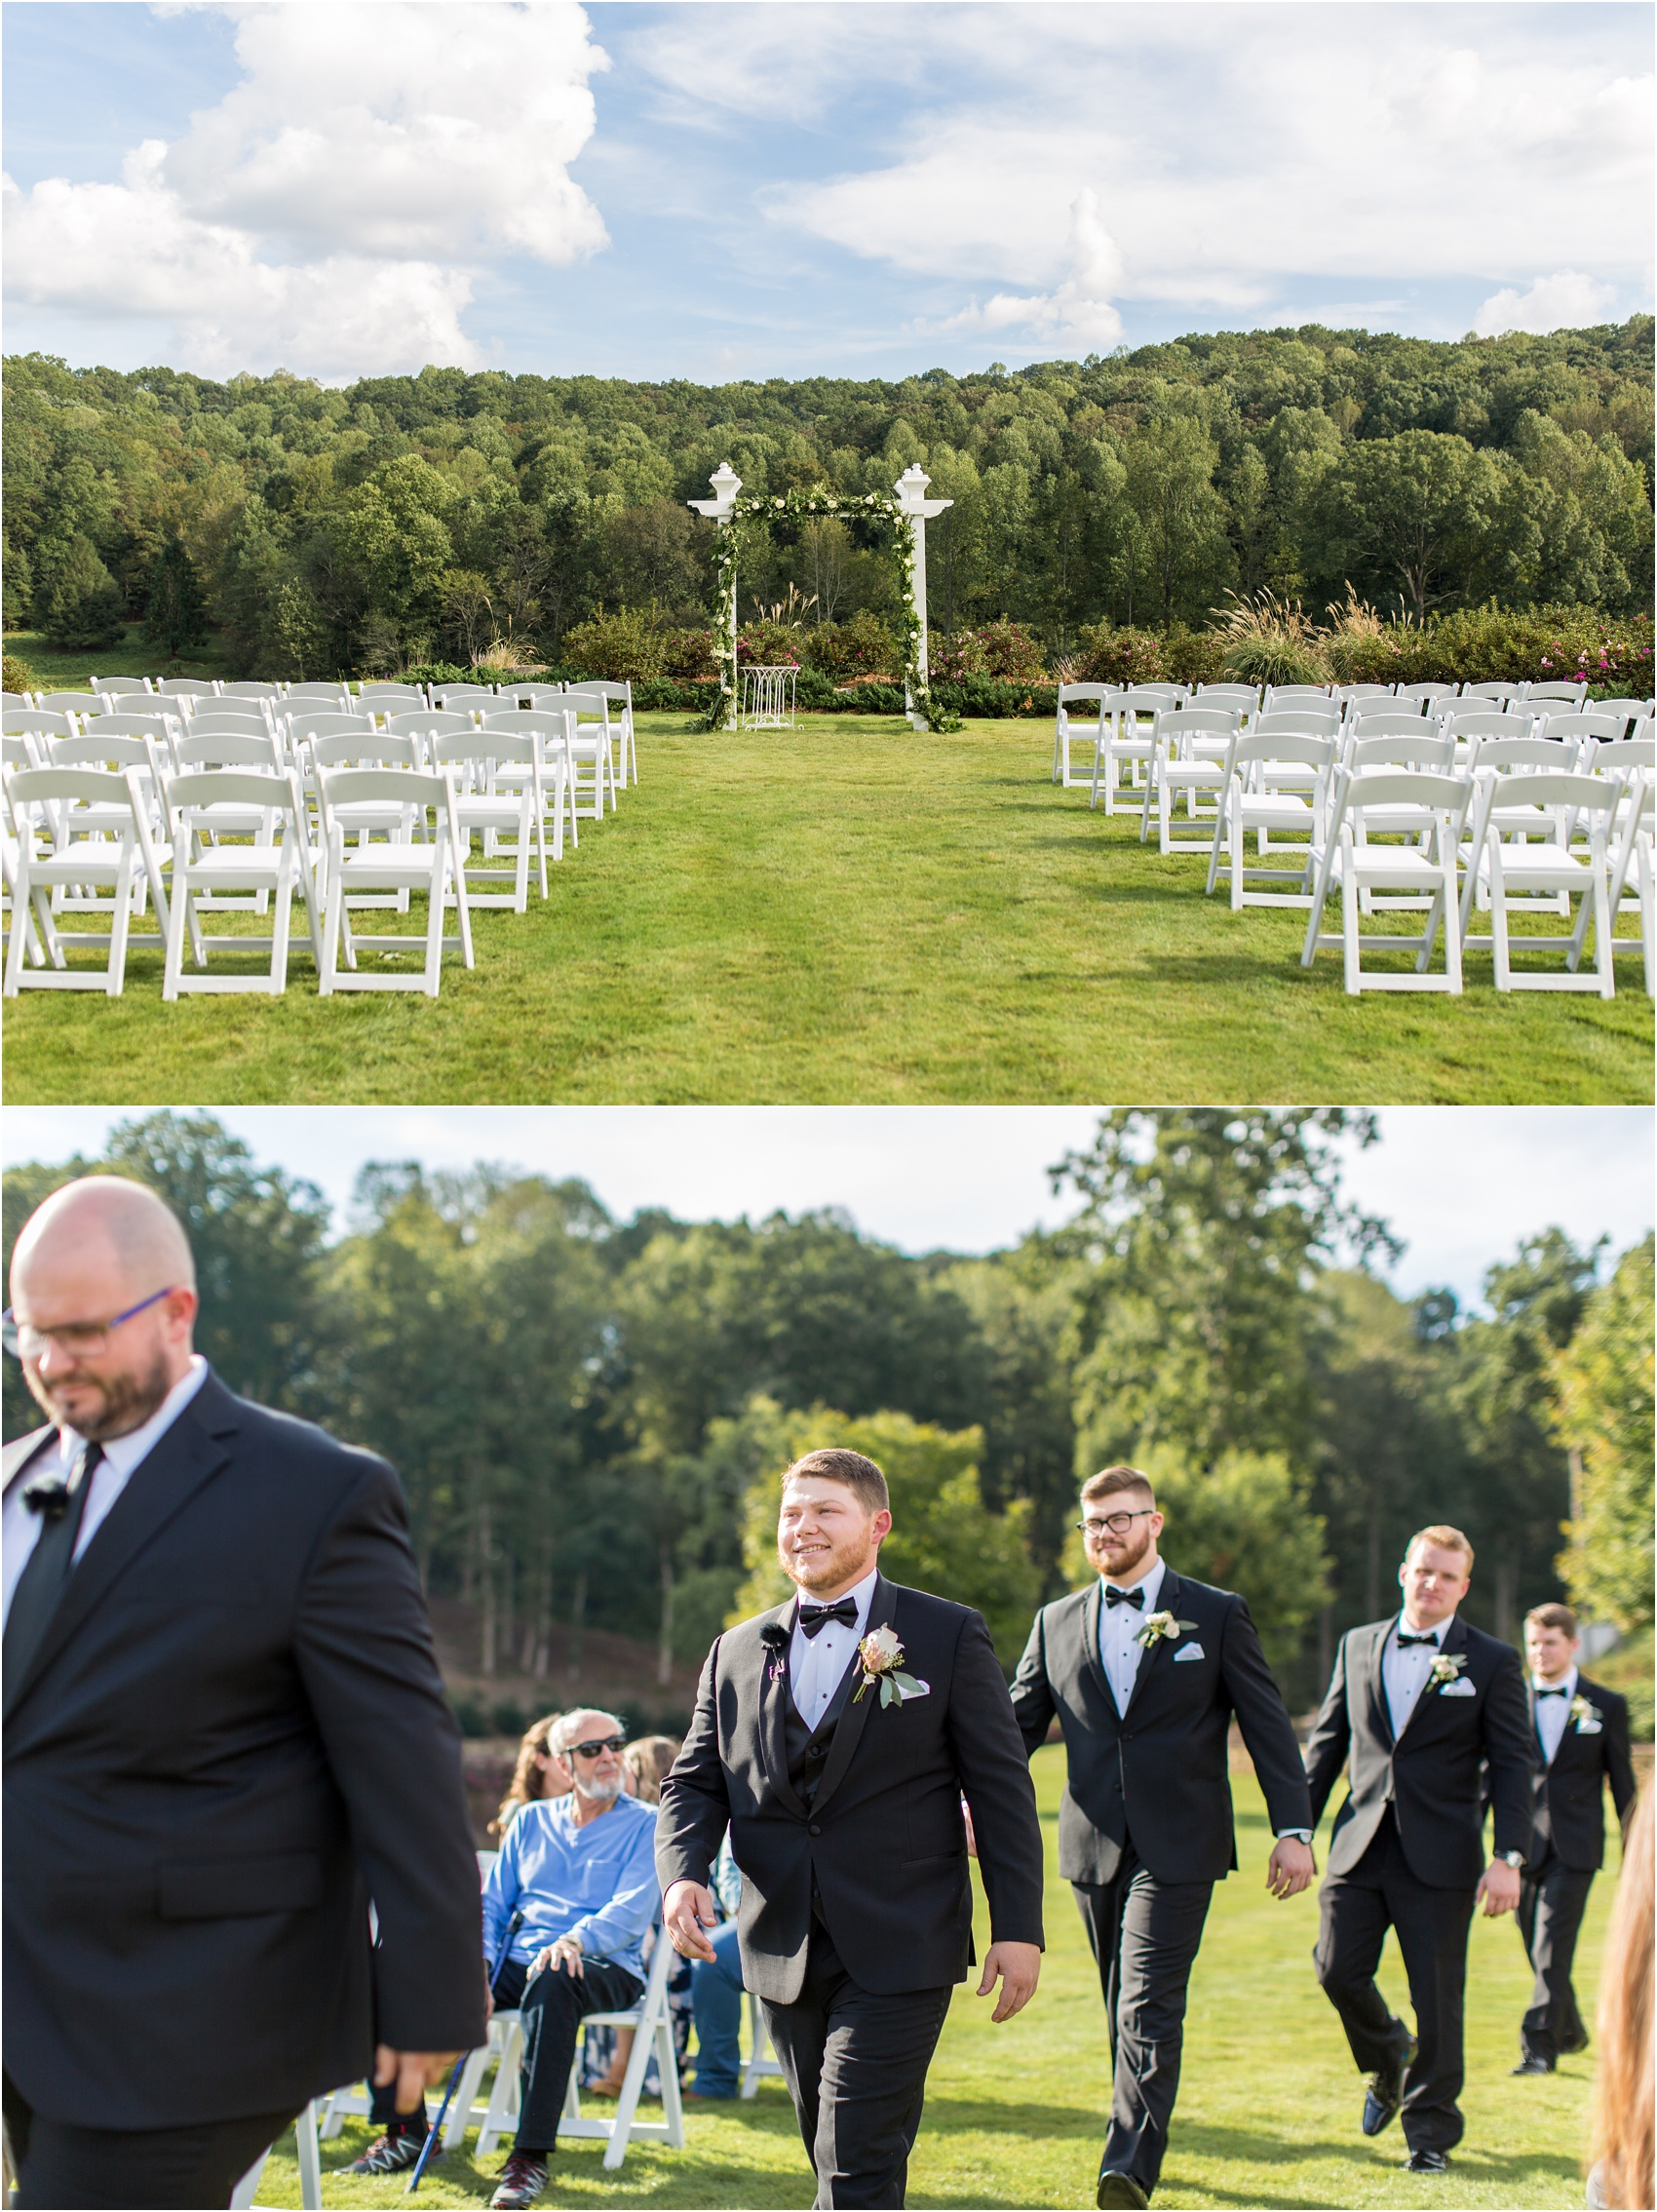 Savannah Eve Photography- Jurek-Woodworth Wedding- Sneak Peek-32.jpg